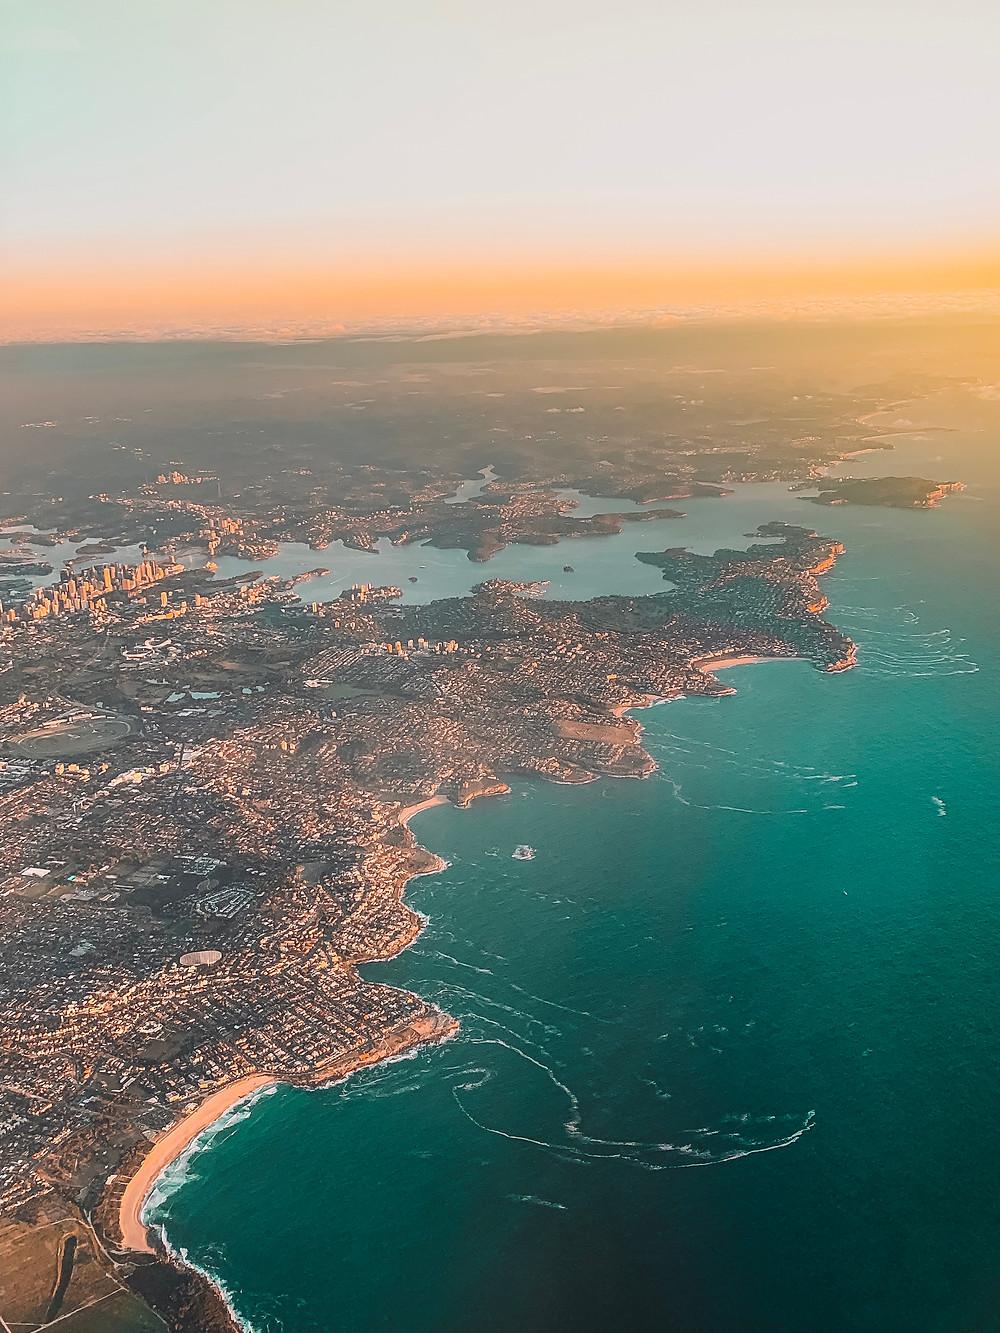 Aerial view of Sydney Harbor and Coastline at Sunrise